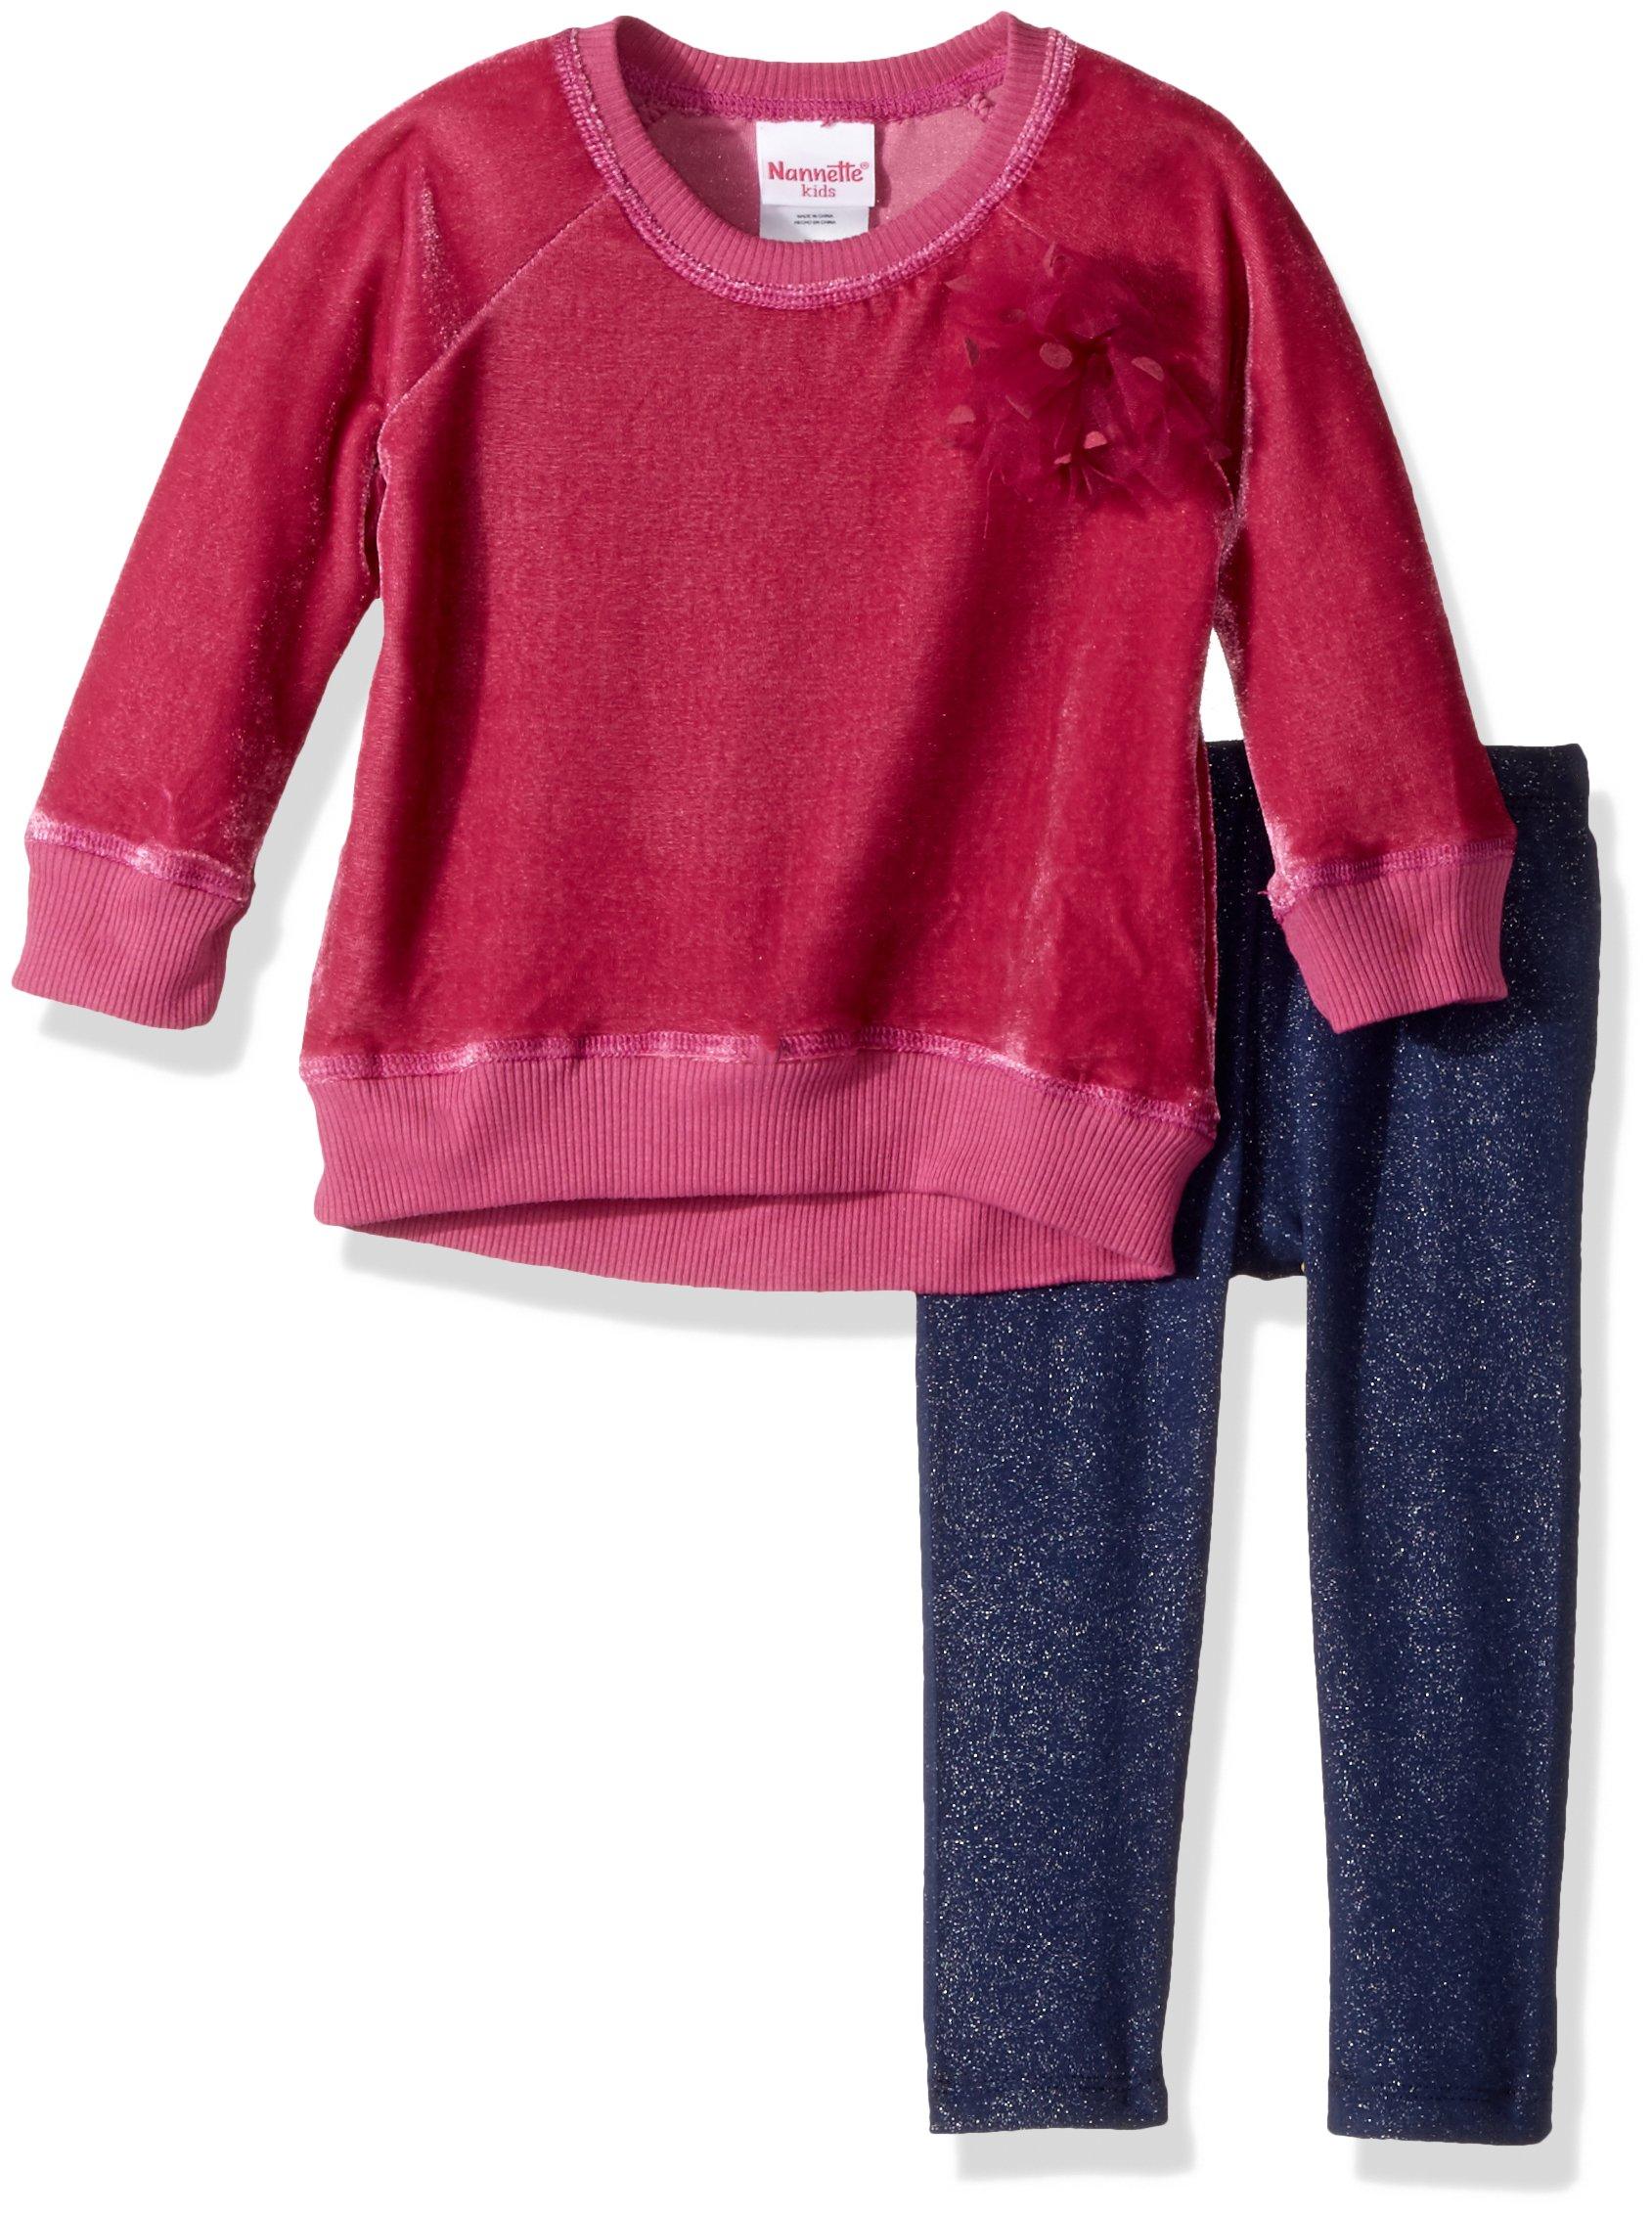 Nannette Baby Girls' 2 Piece Velvet Sweatshirt Set, Red, 12m